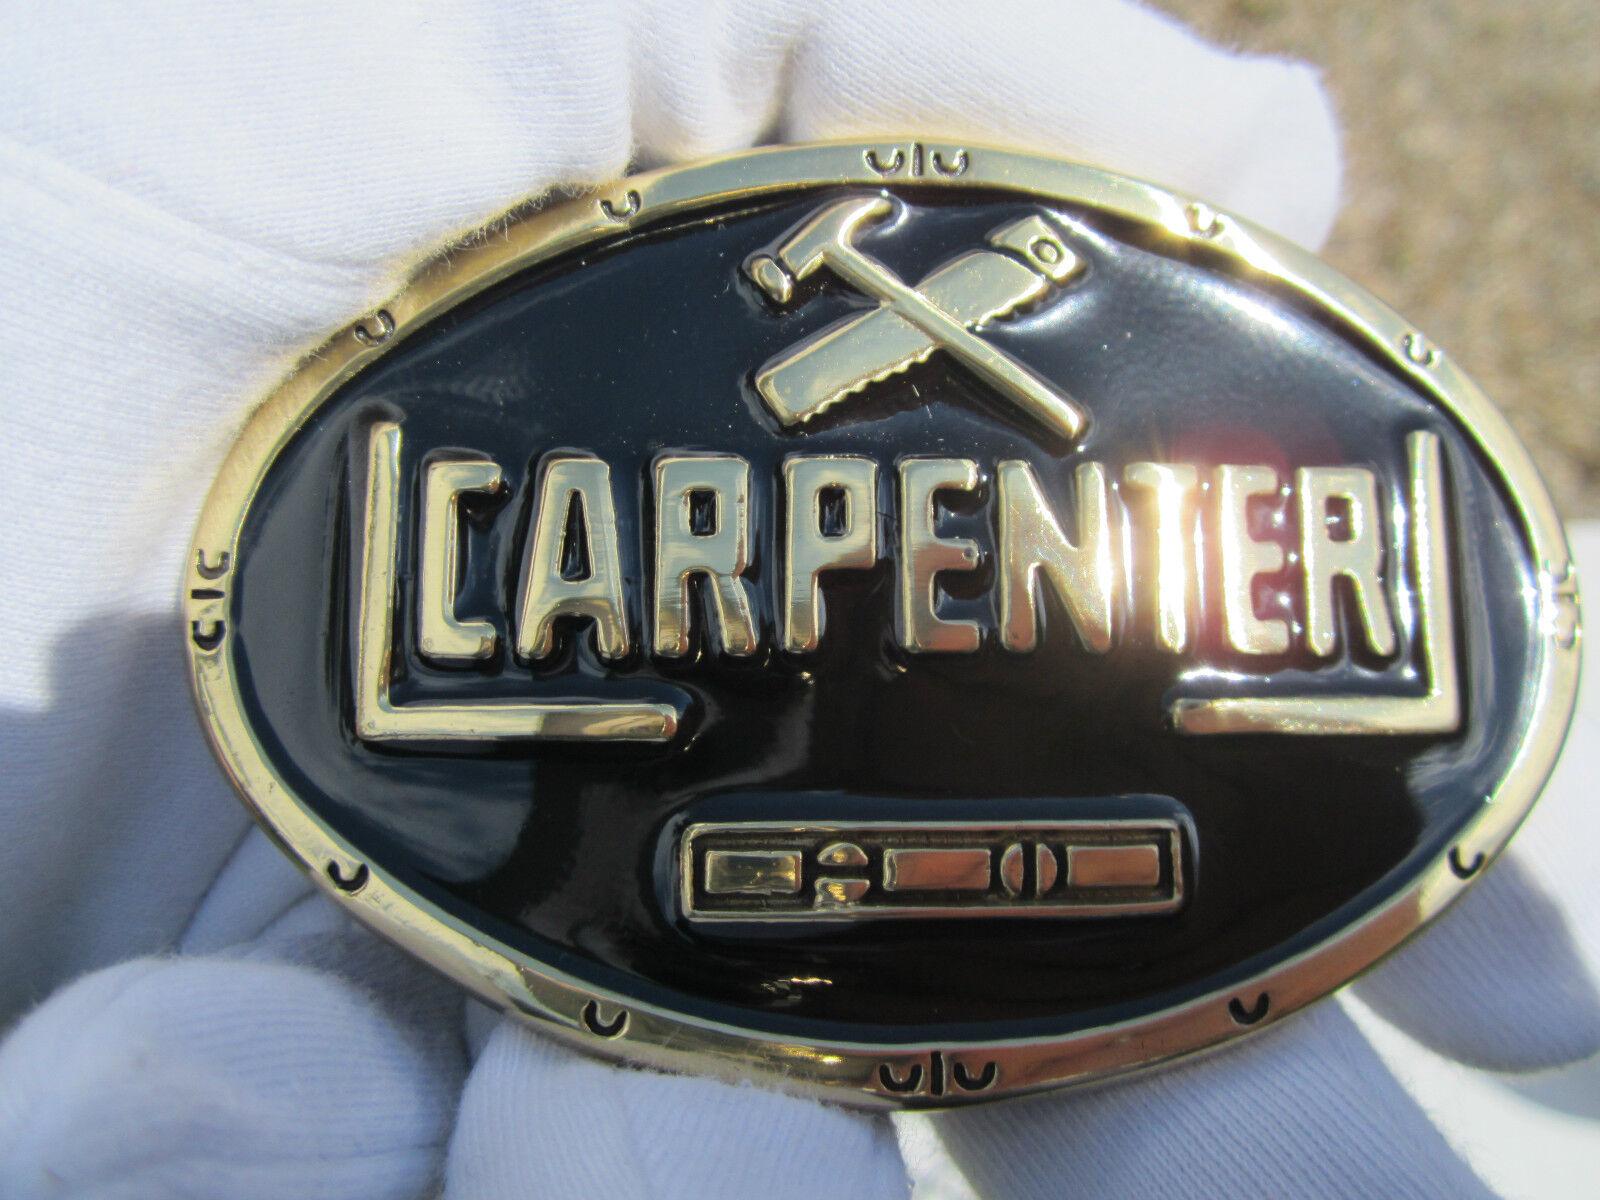 Carpenters belt buckle carpentry woodwork.